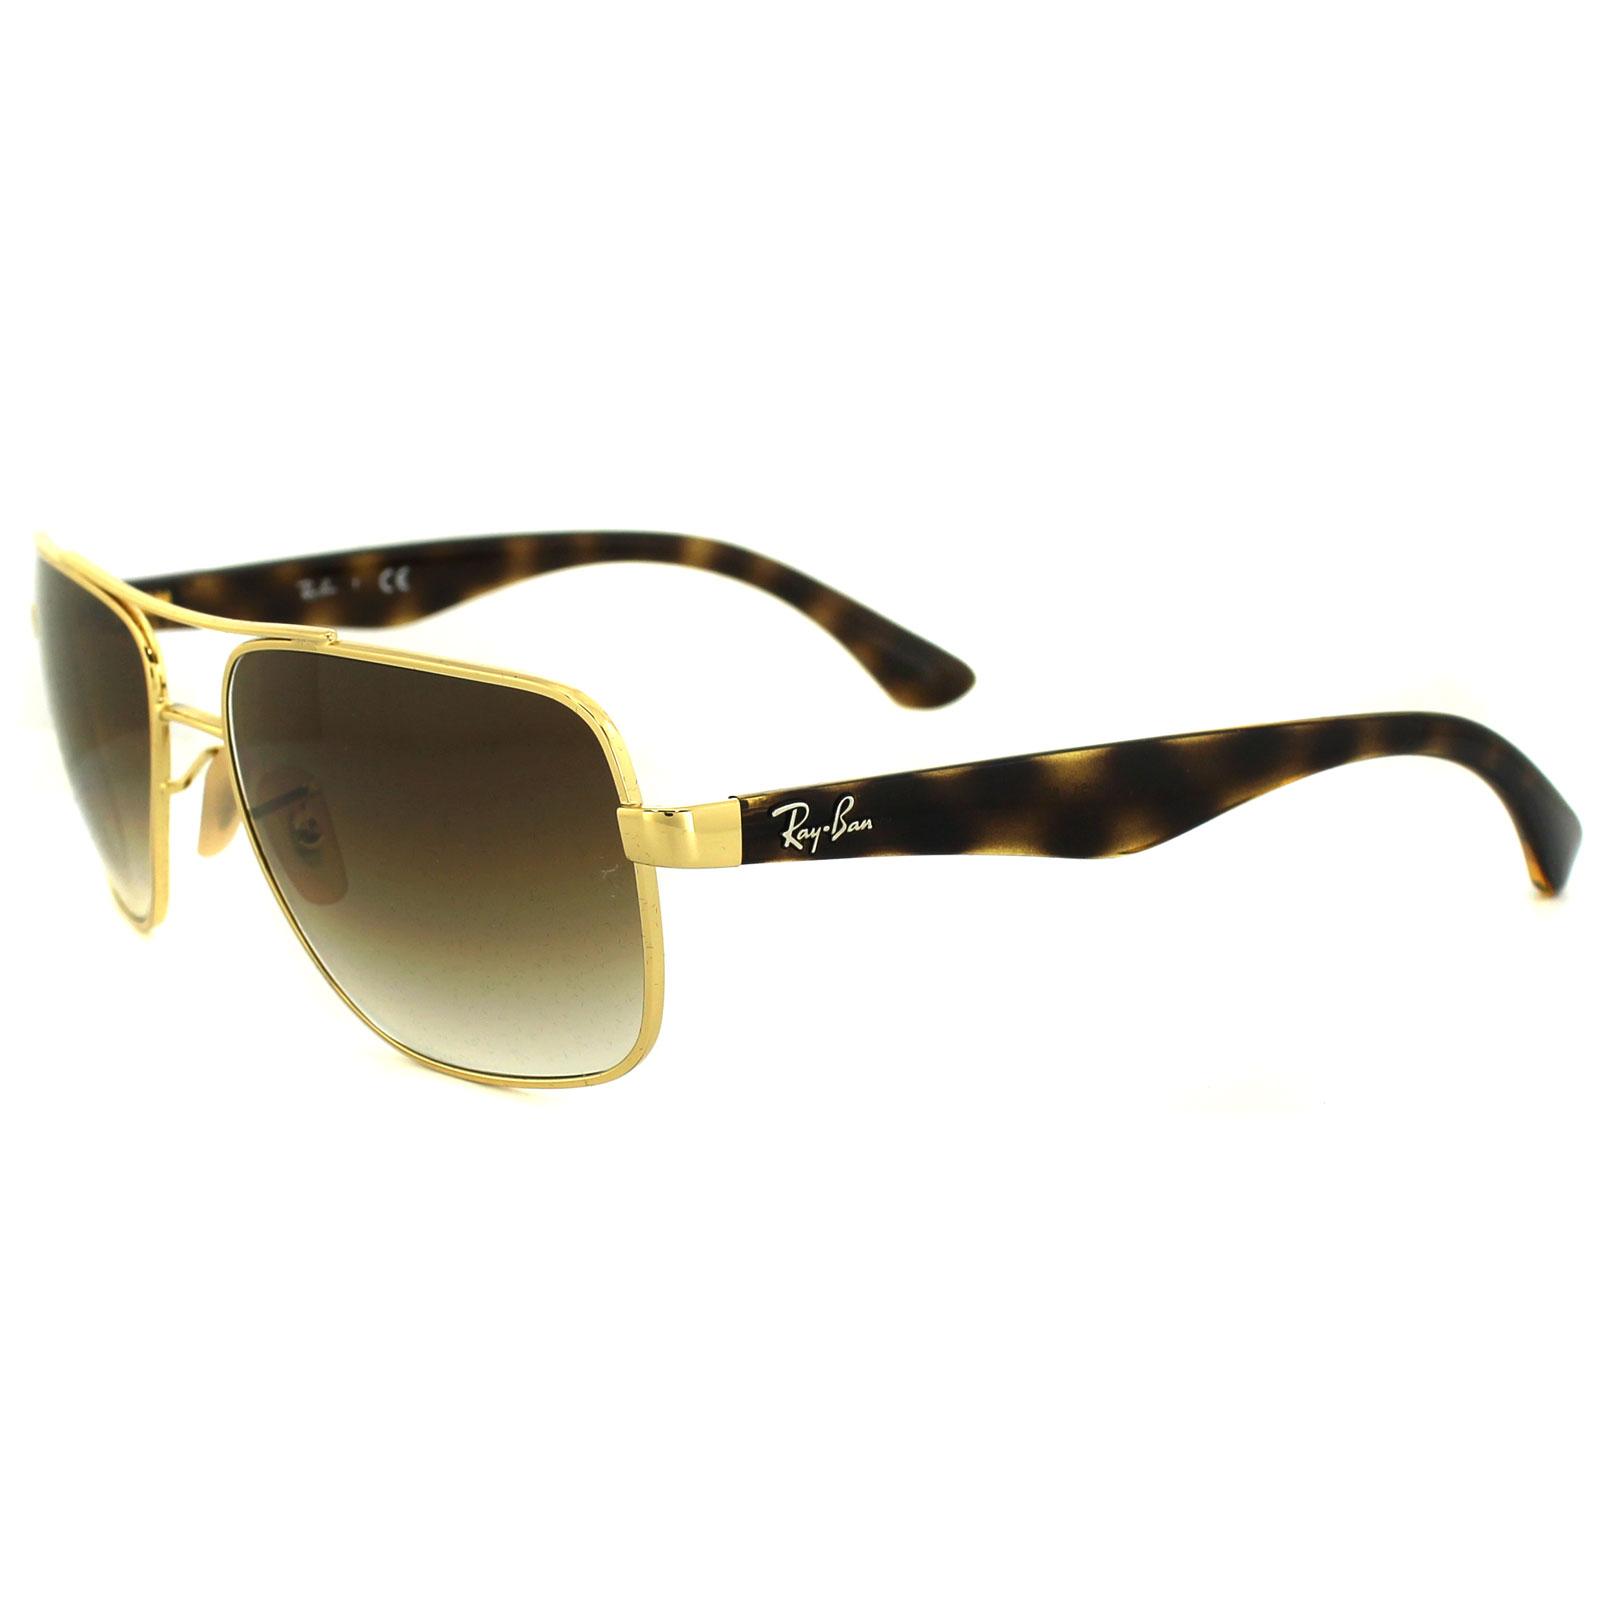 Cheap Ray-Ban 3483 Sunglasses - Discounted Sunglasses Ray Ban 004 58  Polarized ... 73efaf1676